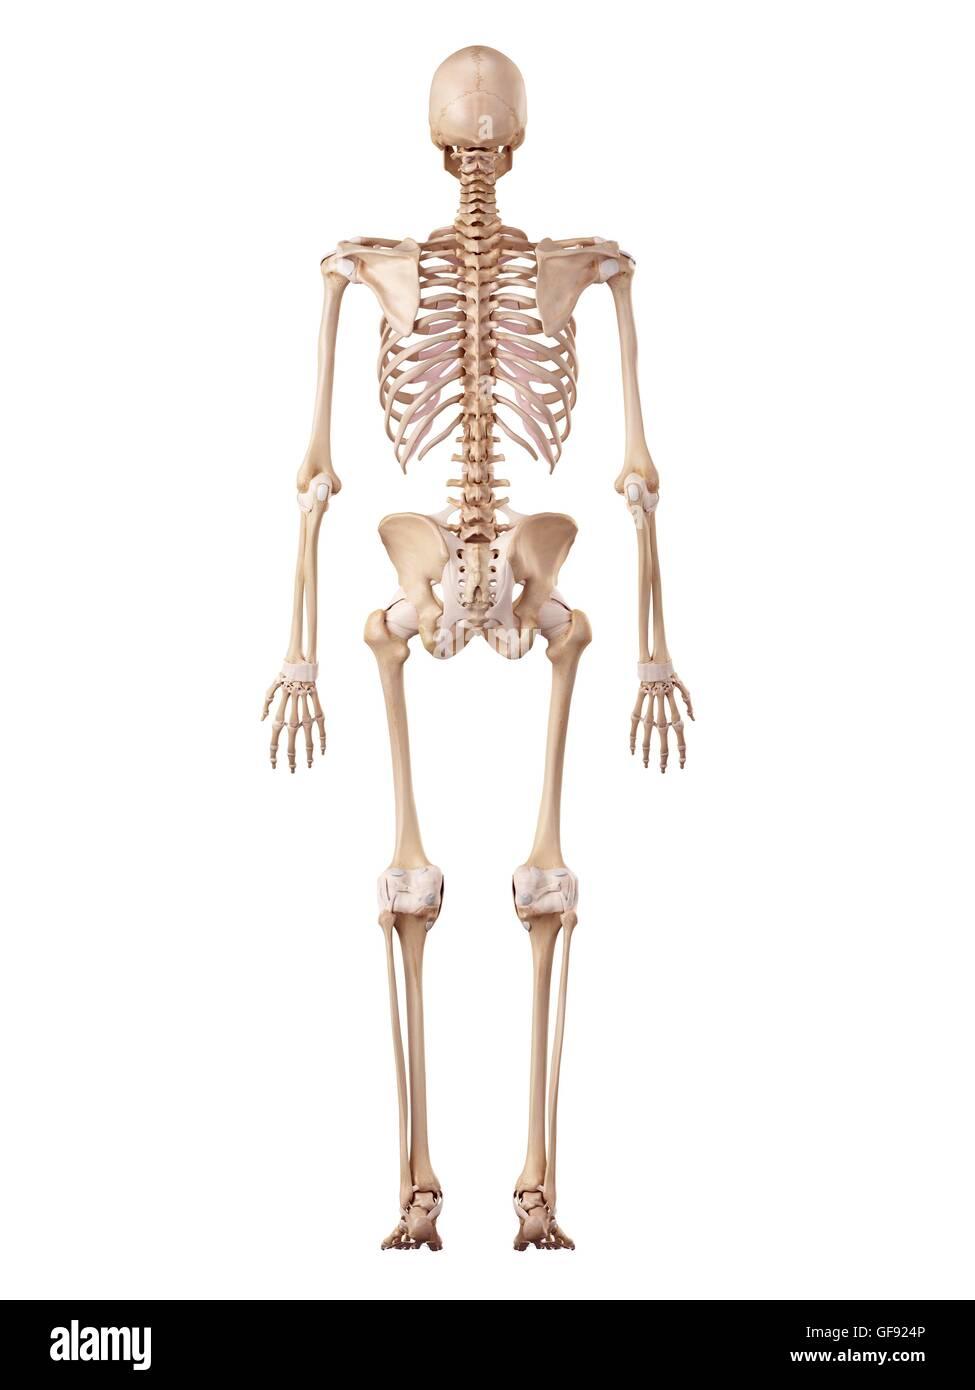 Human skeletal system, illustration Stock Photo: 112681318 - Alamy